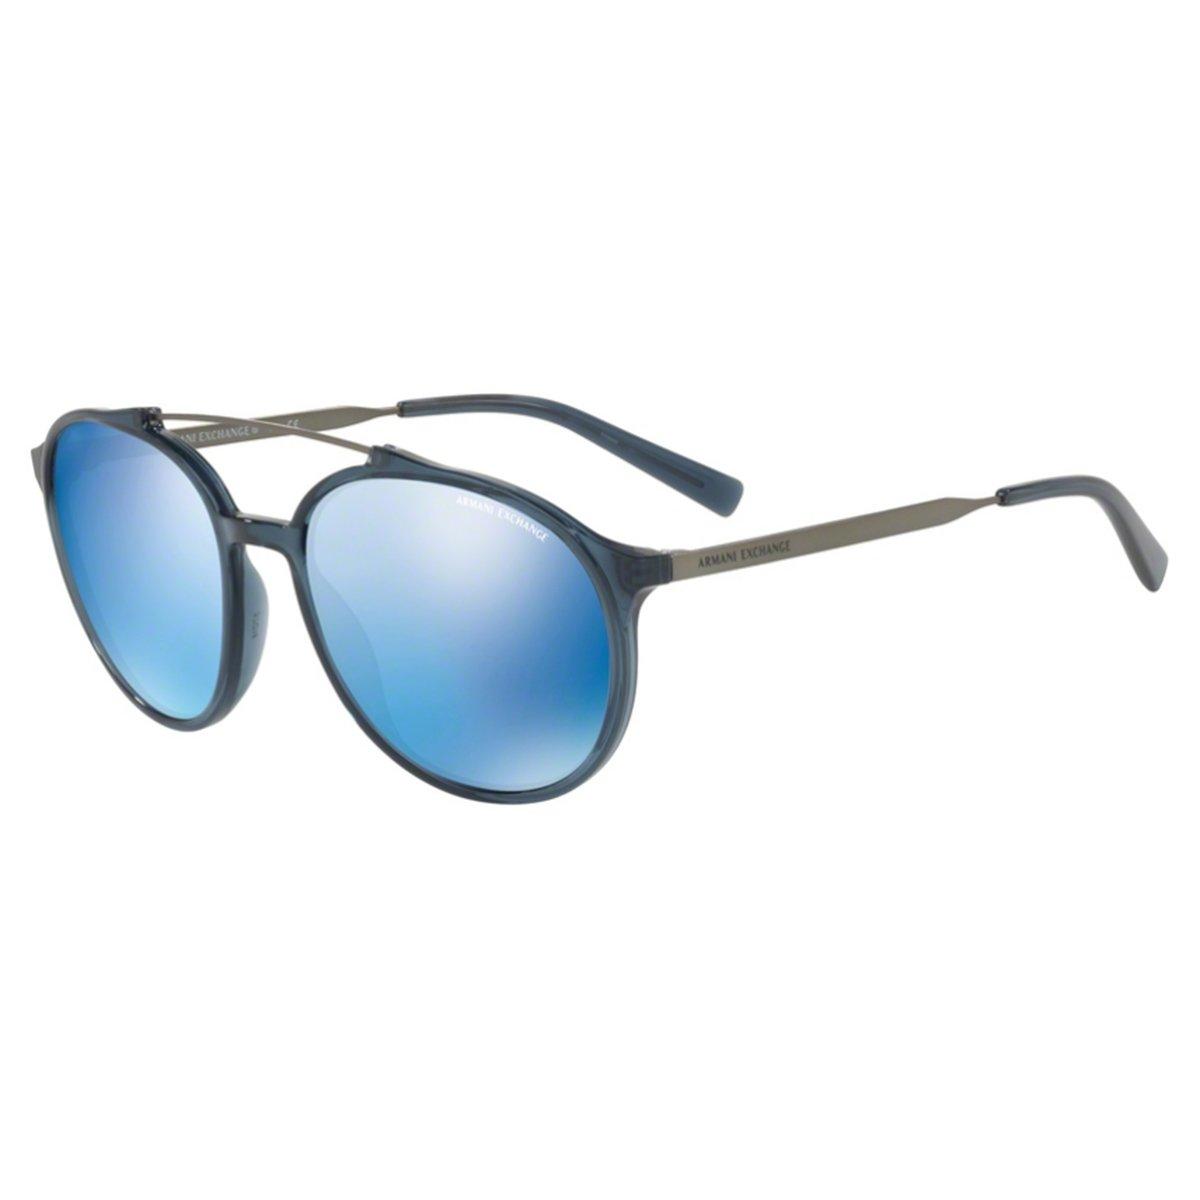 0dc0de5e70fb6 Compre Óculos de Sol Armani Exchange em 10X   Tri-Jóia Shop